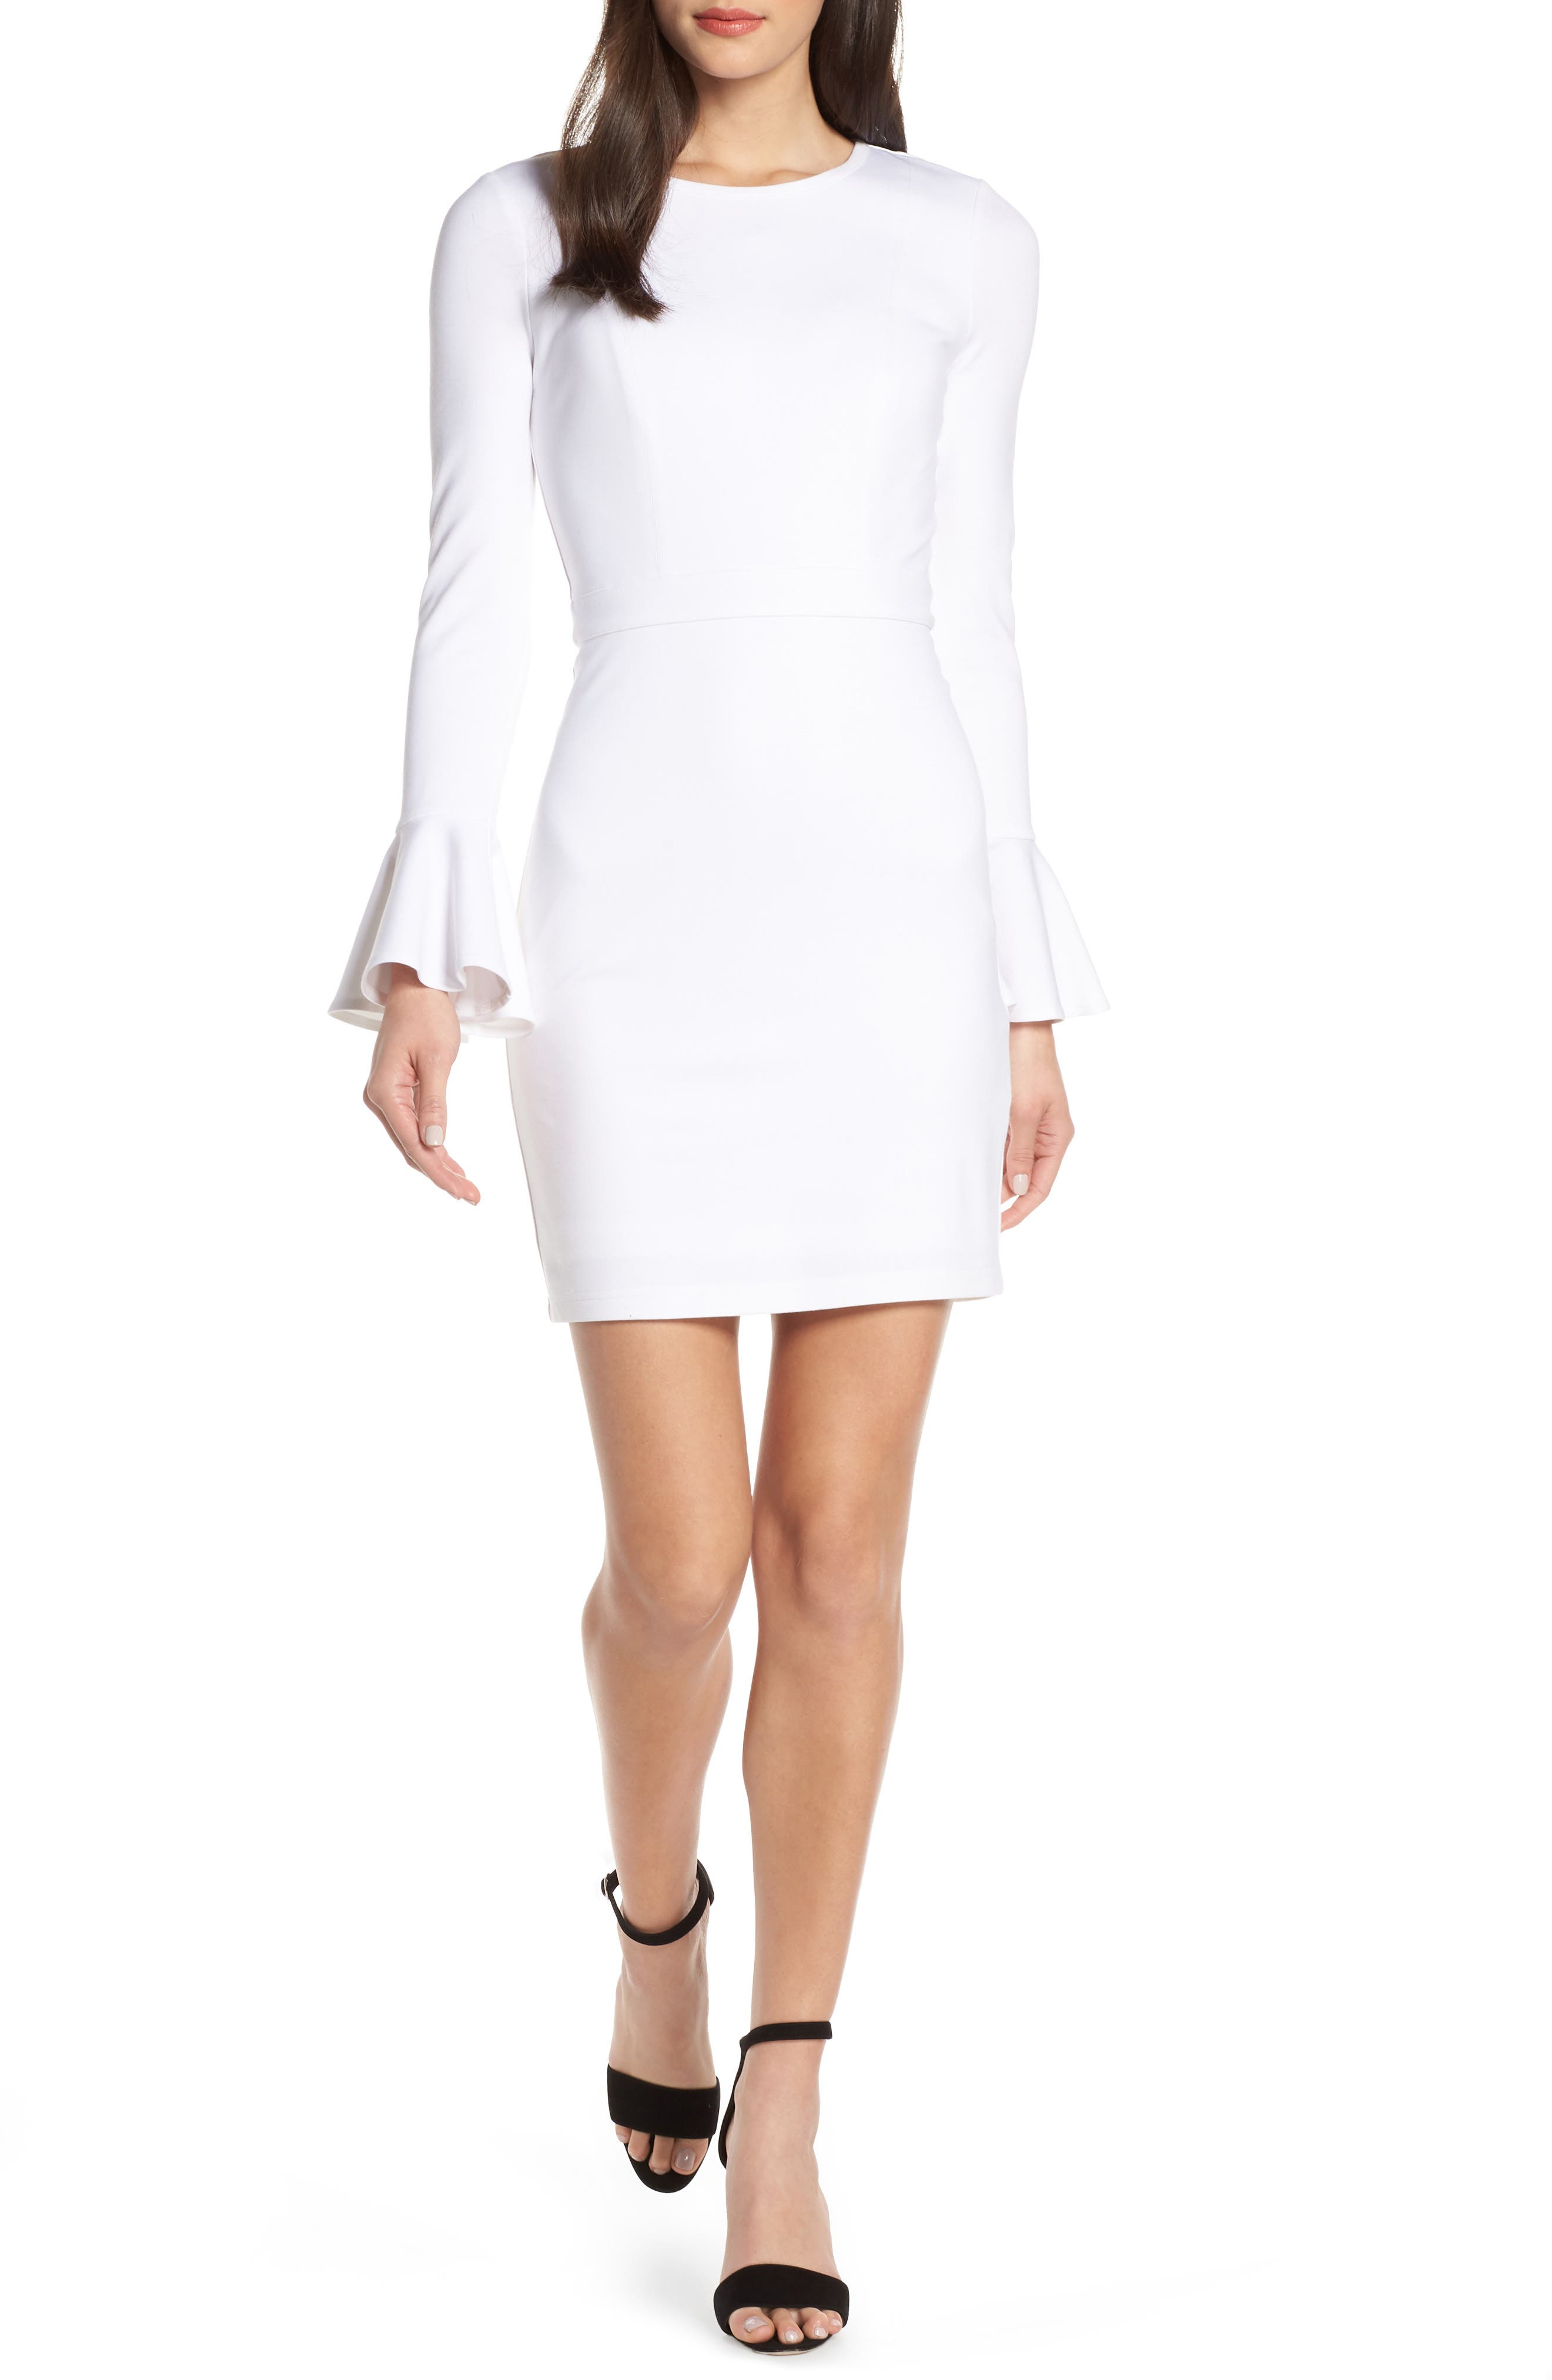 ALI & JAY, Pavillion Bell Cuff Sheath Dress, Main thumbnail 1, color, WHITE